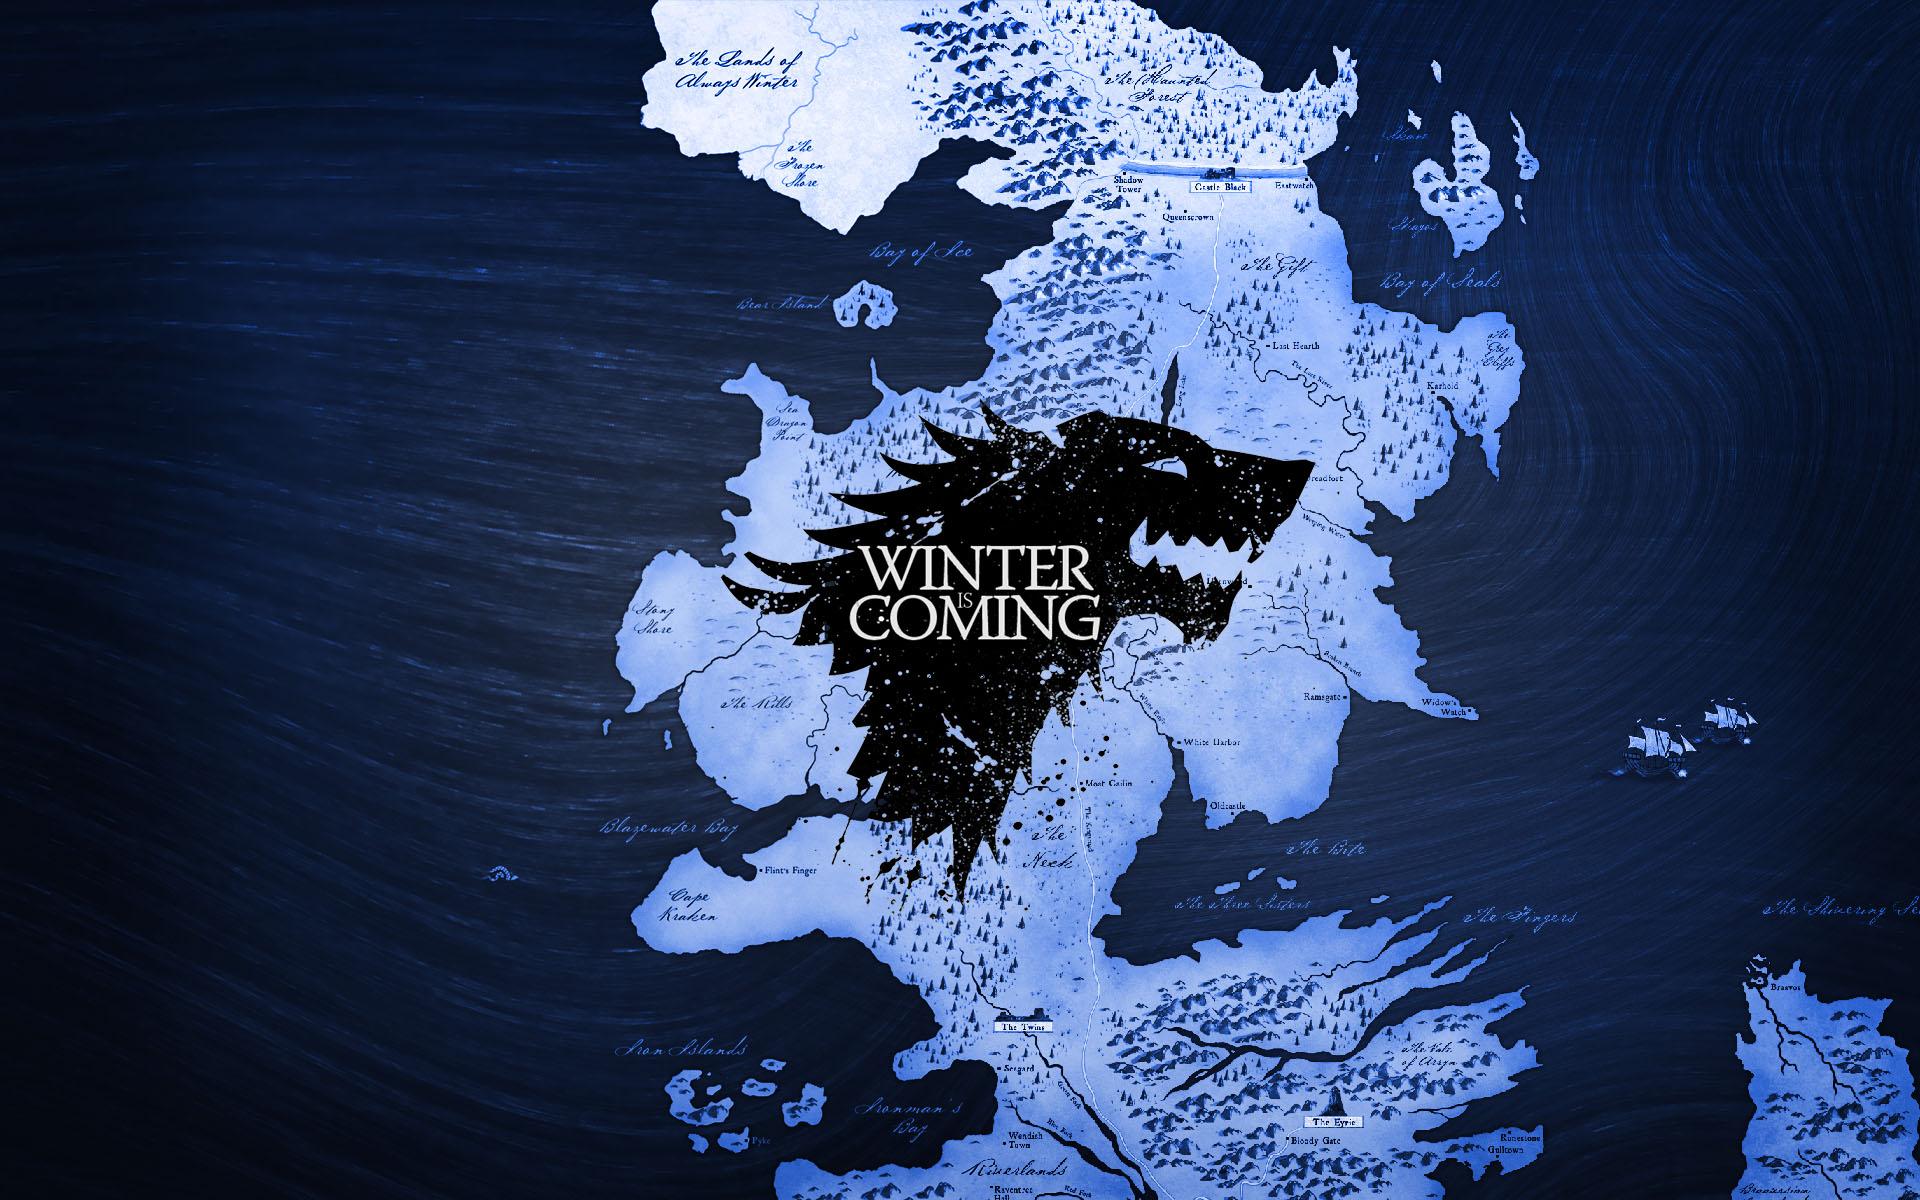 Christmas Game Of Thrones Sigil Direwolf House Stark Wide Wallpaper 1920x1200